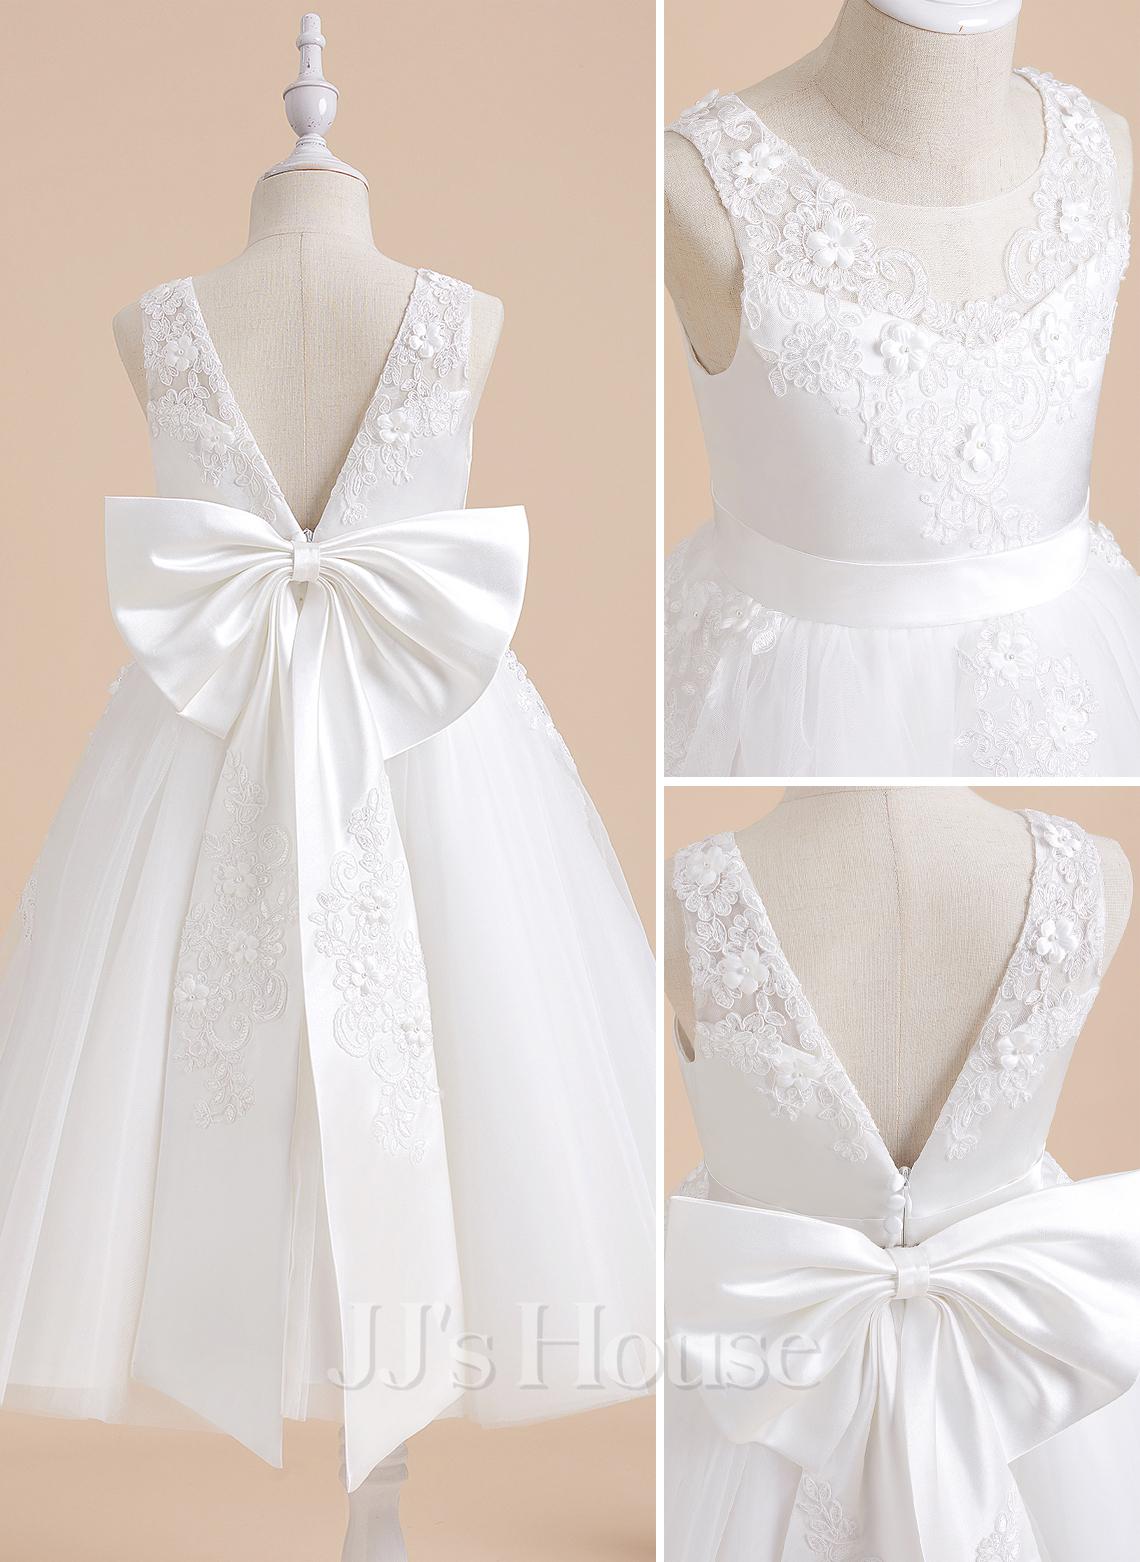 A-Line Tea-length Flower Girl Dress - Lace Sleeveless With Beading/Flower(s)/Bow(s)